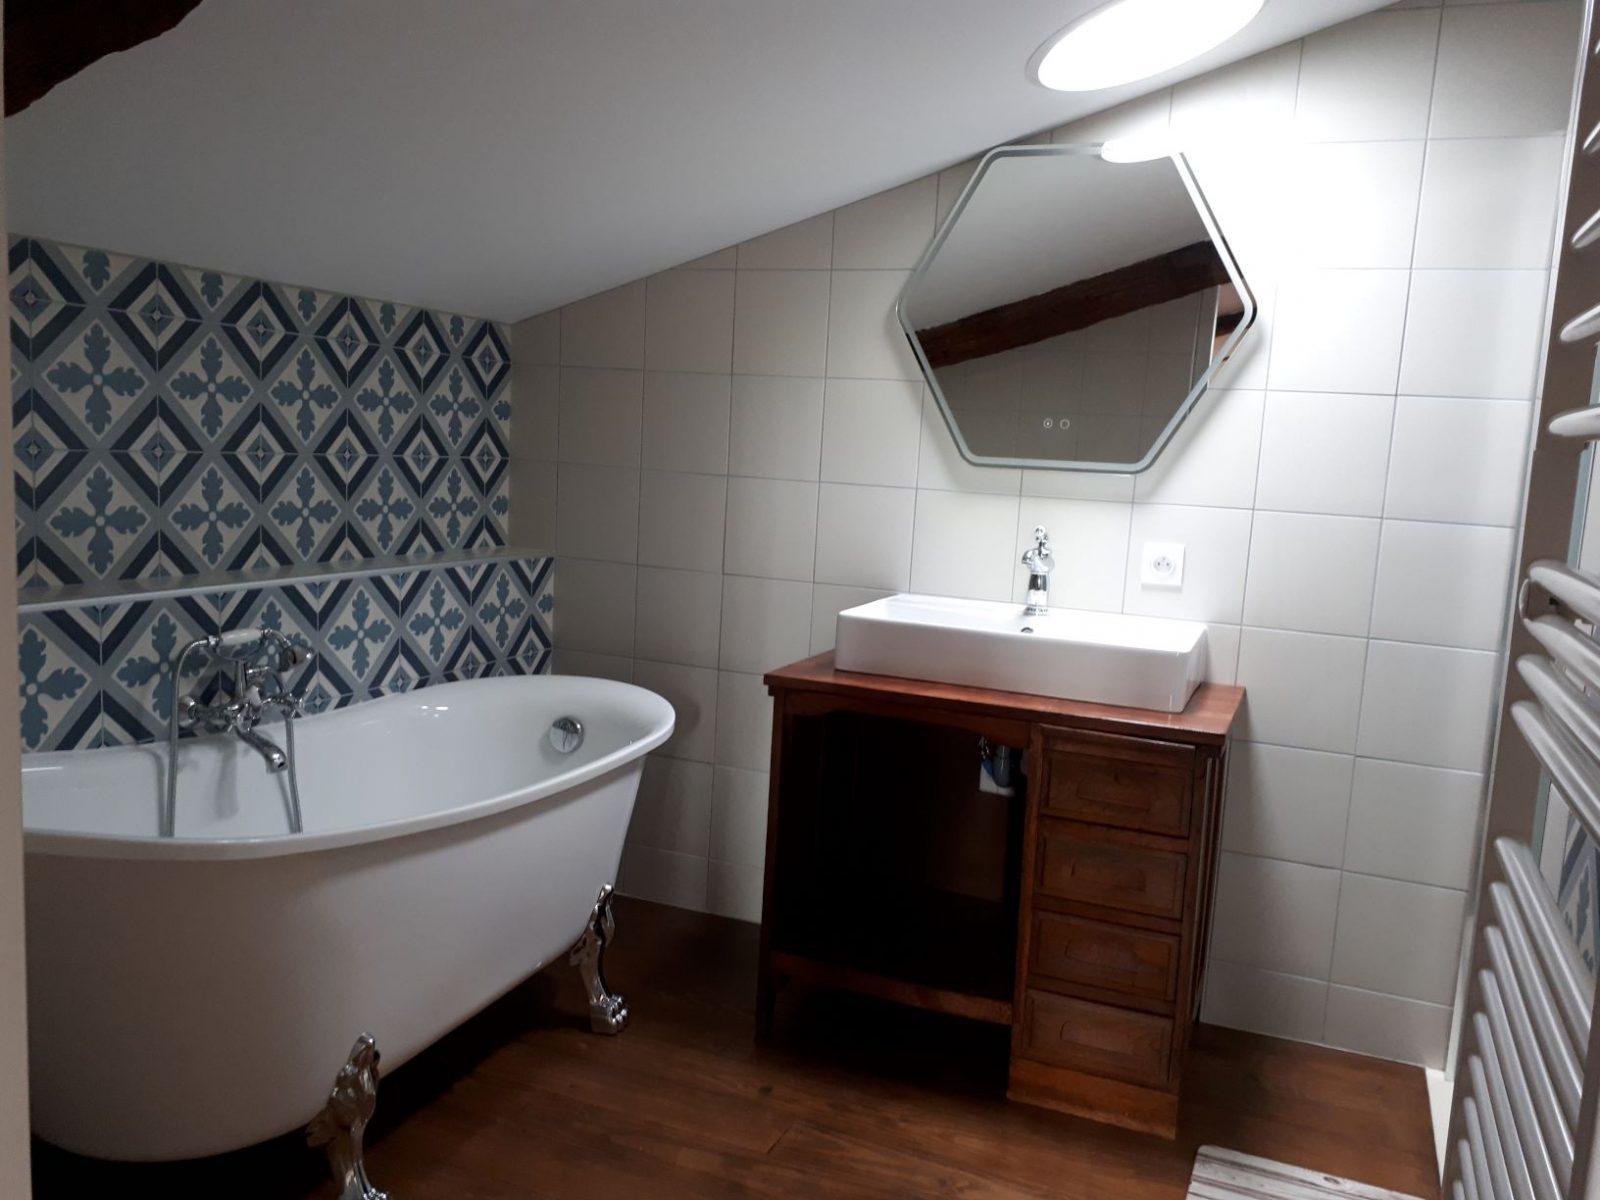 salle de bain 1- Domaine de Garat